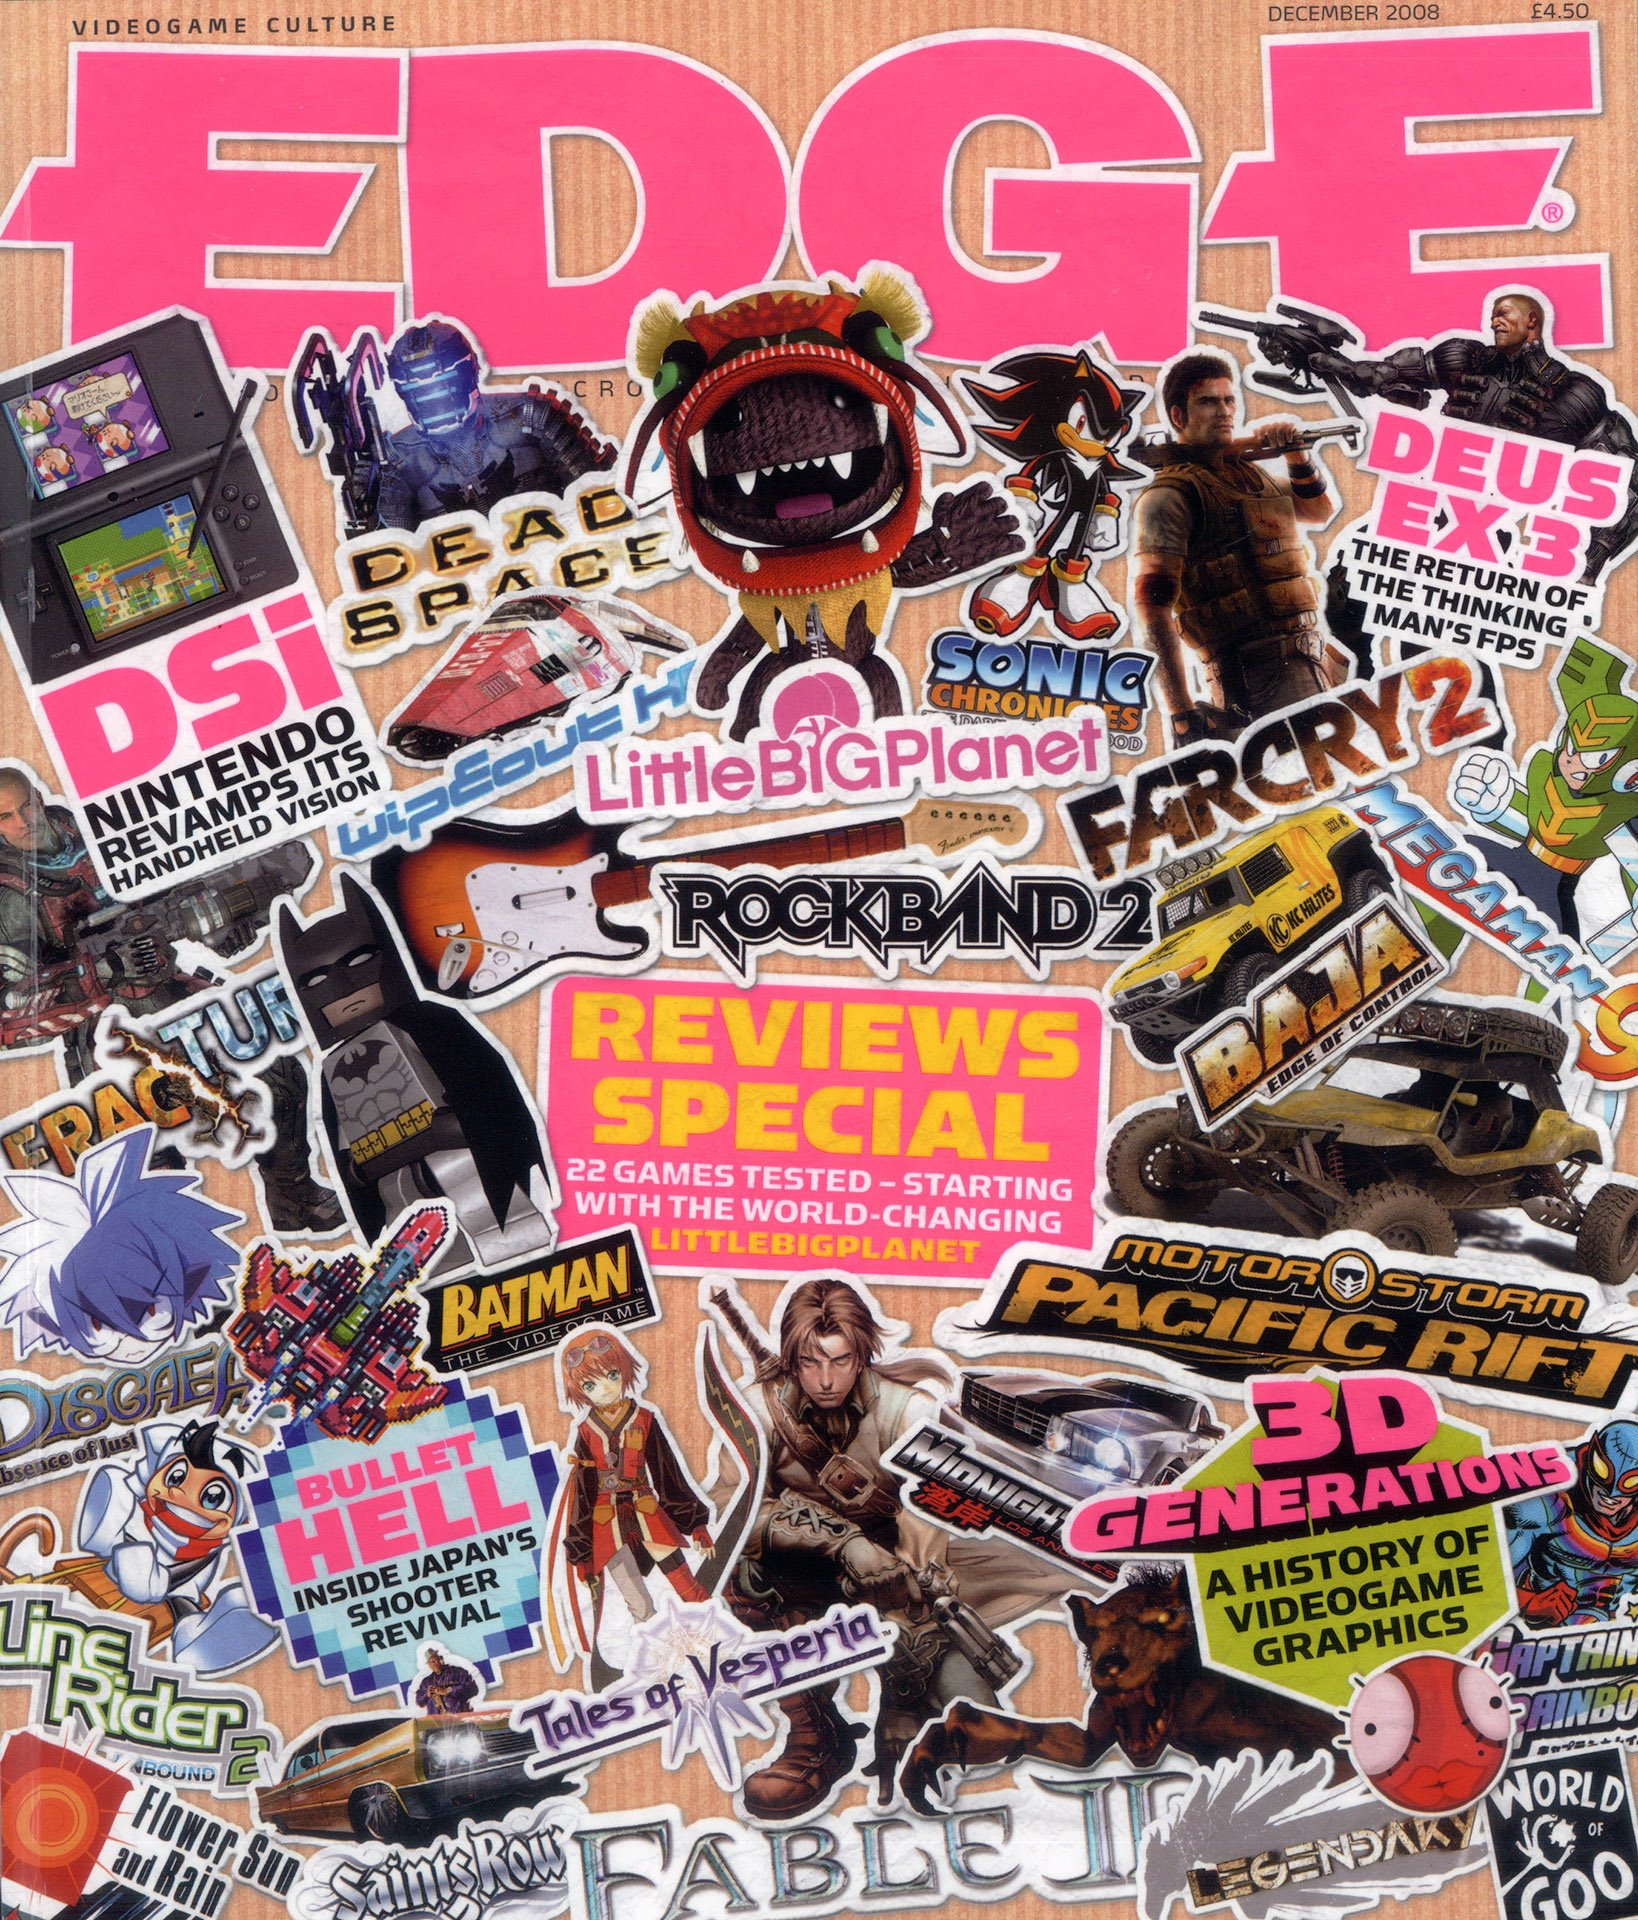 Edge 195 (December 2008)